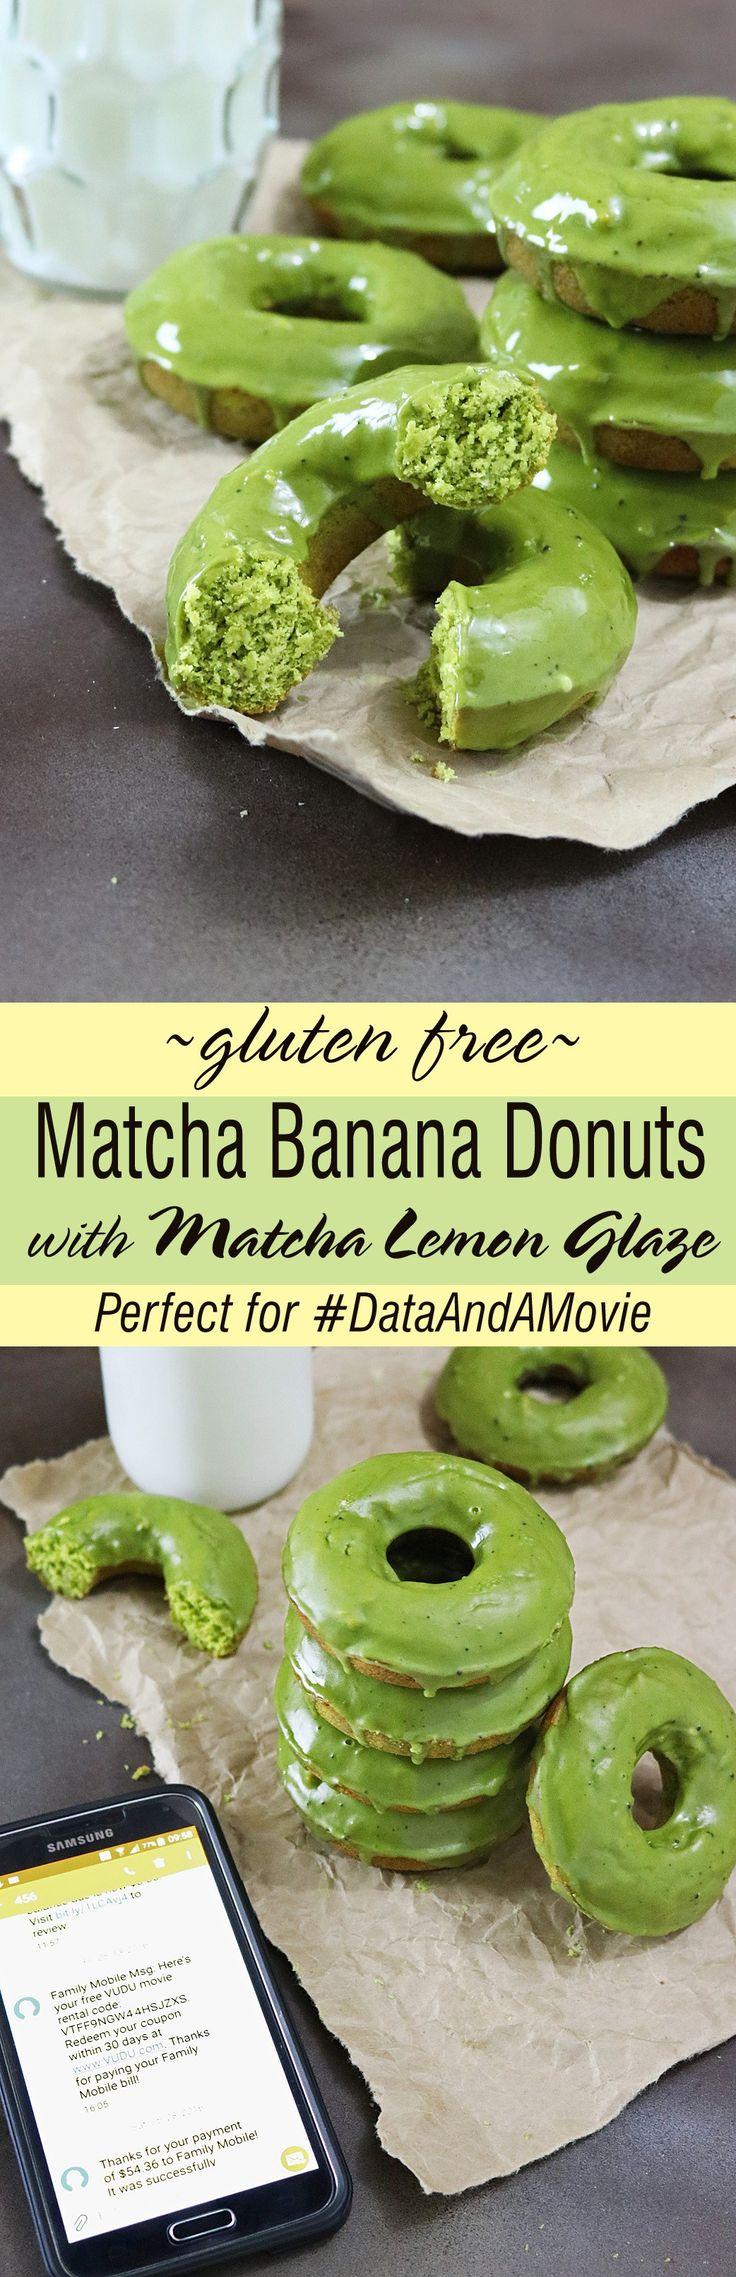 Matcha Banana Donuts With Matcha Lemon Glaze